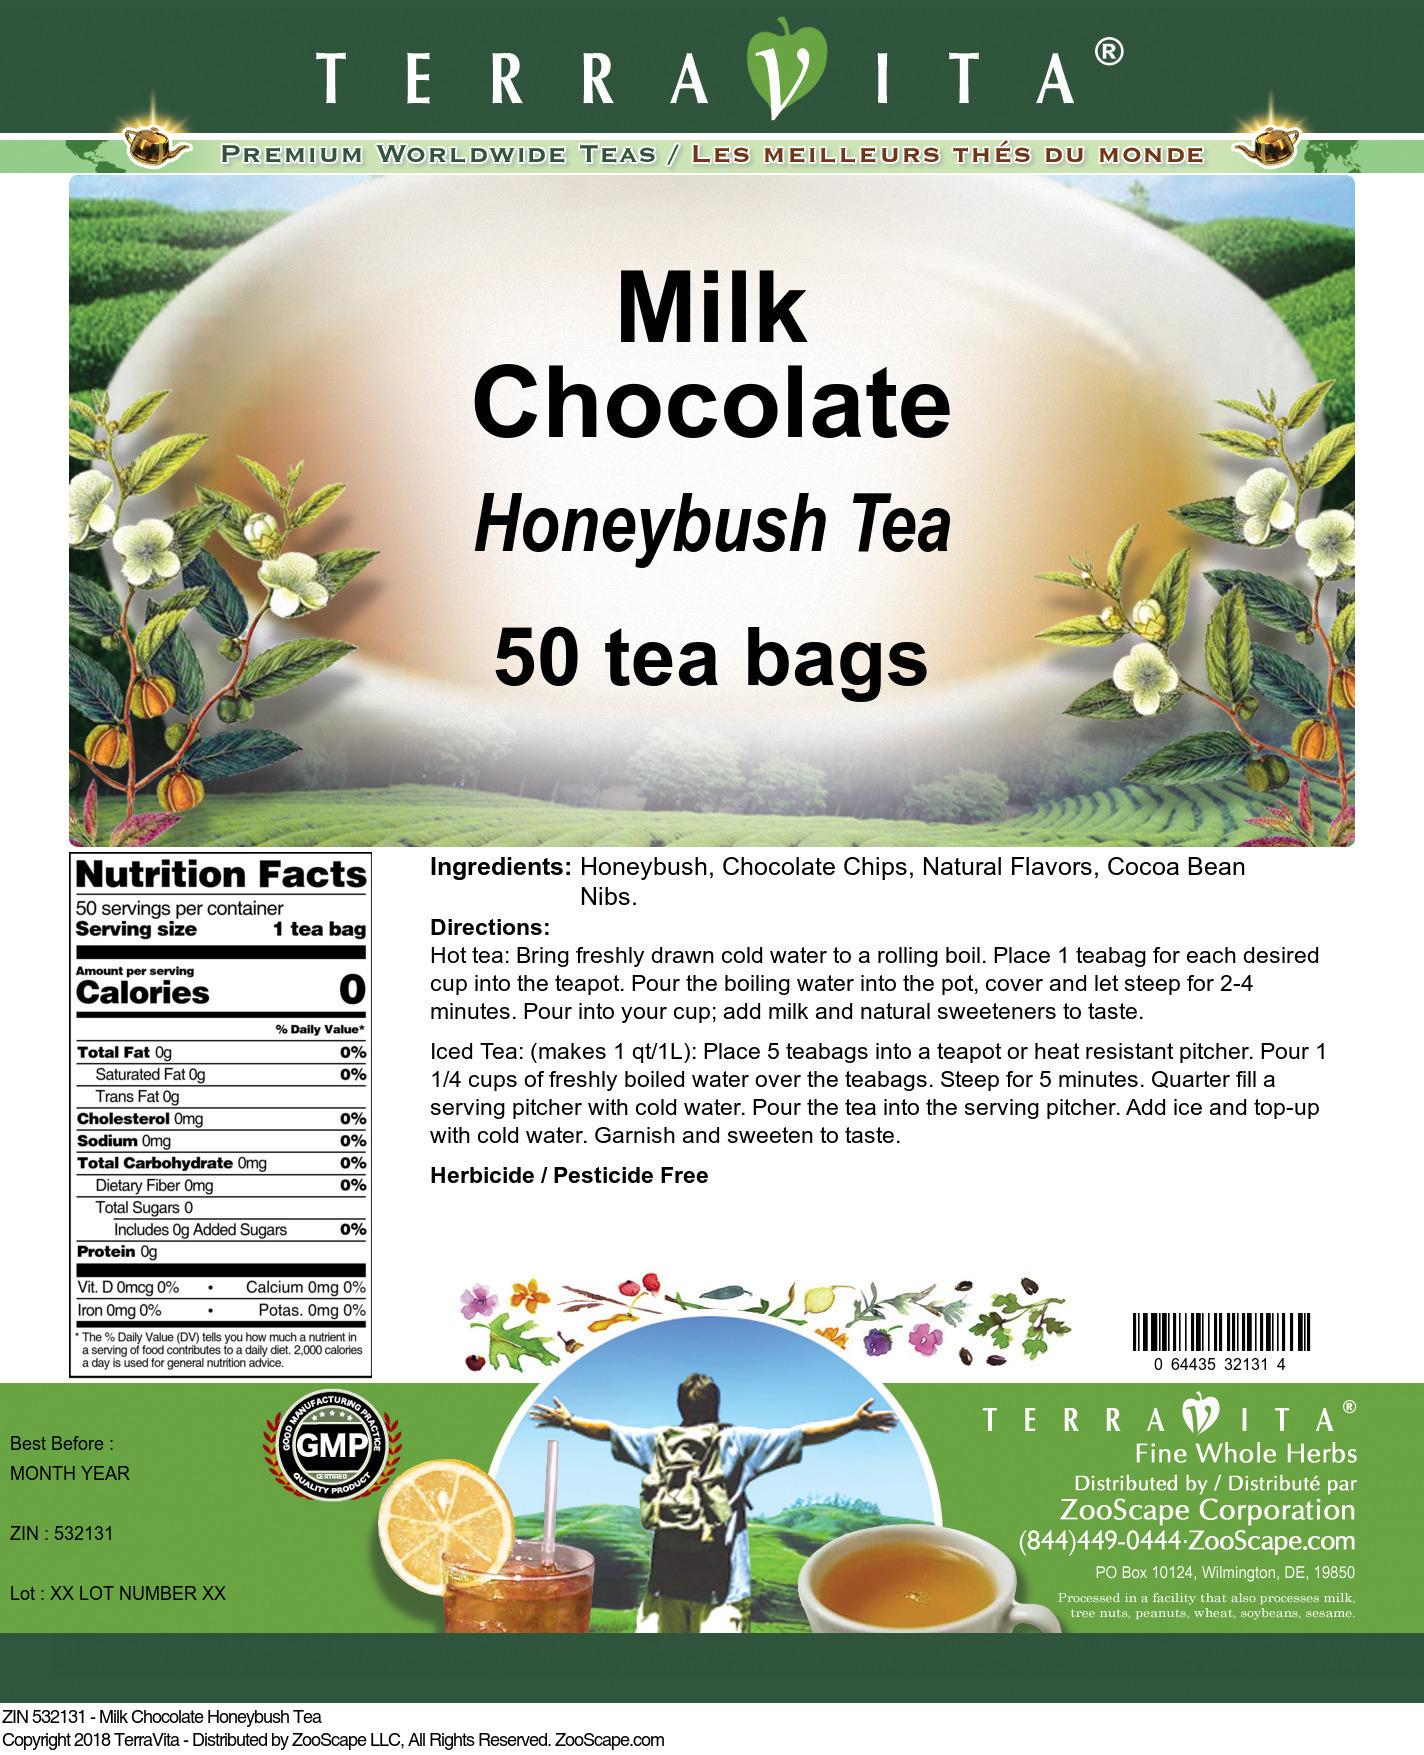 Milk Chocolate Honeybush Tea